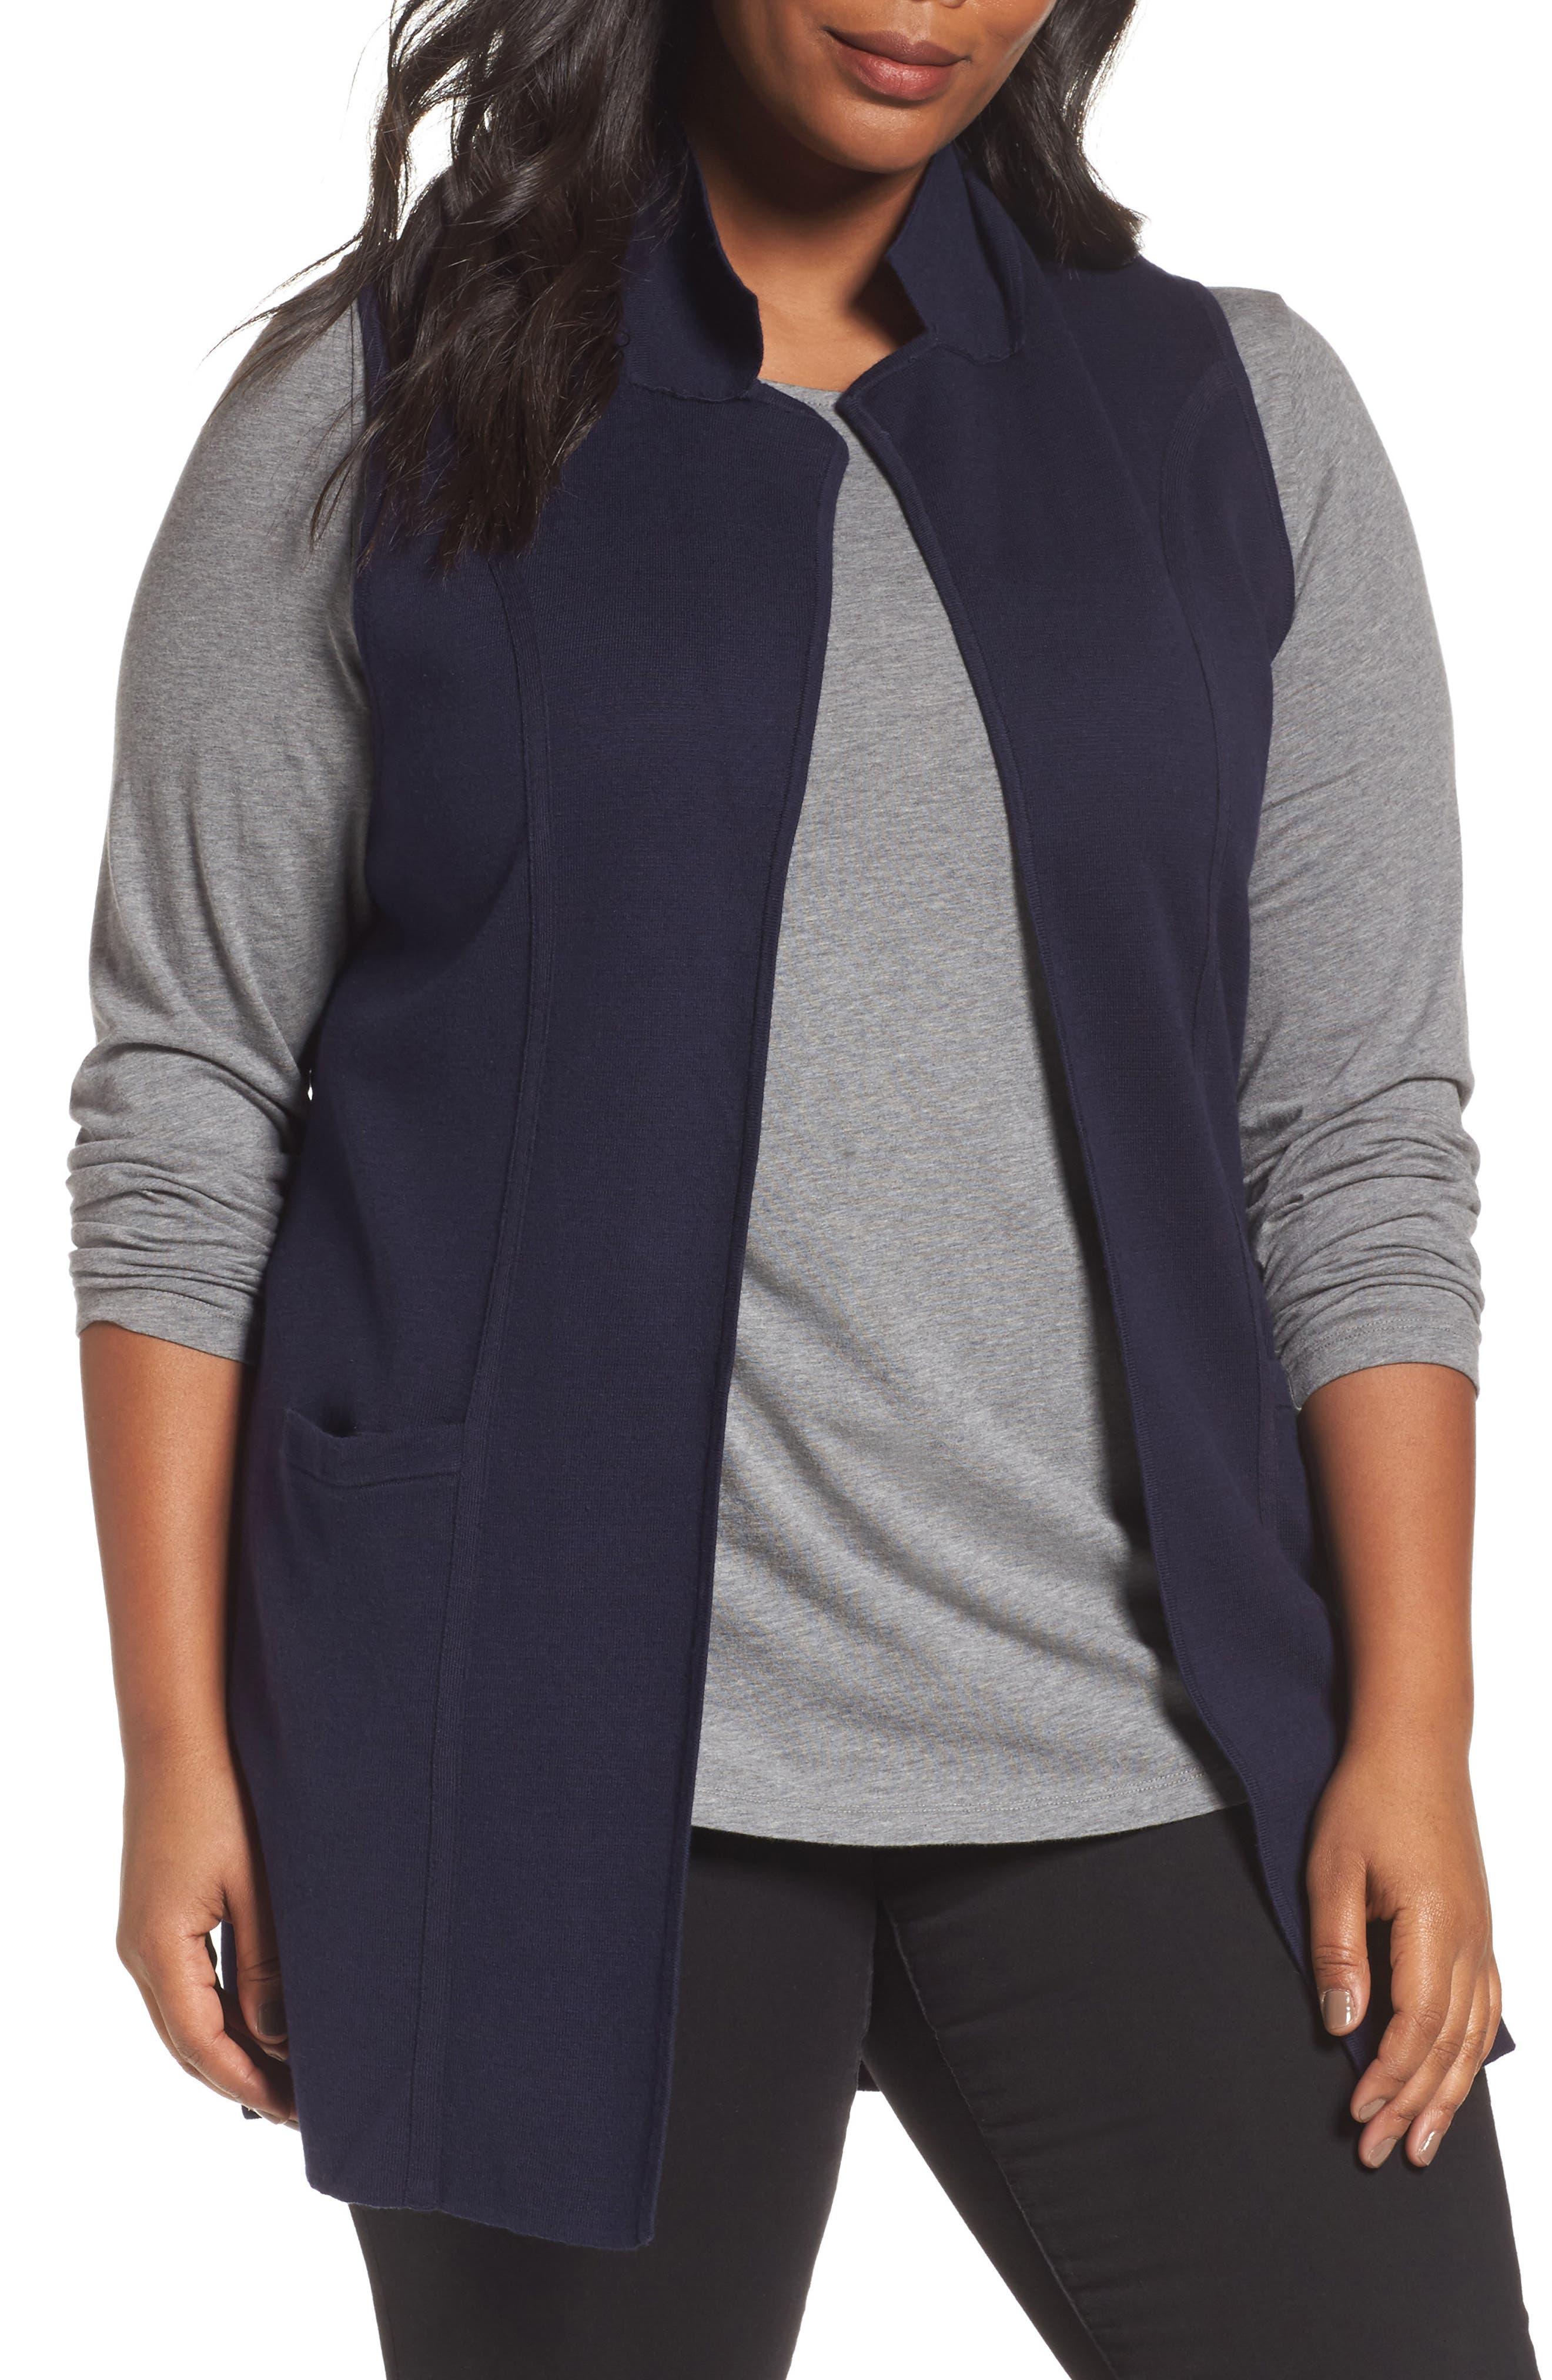 Main Image - Foxcroft Jodi Longline Sweater Vest (Plus Size)